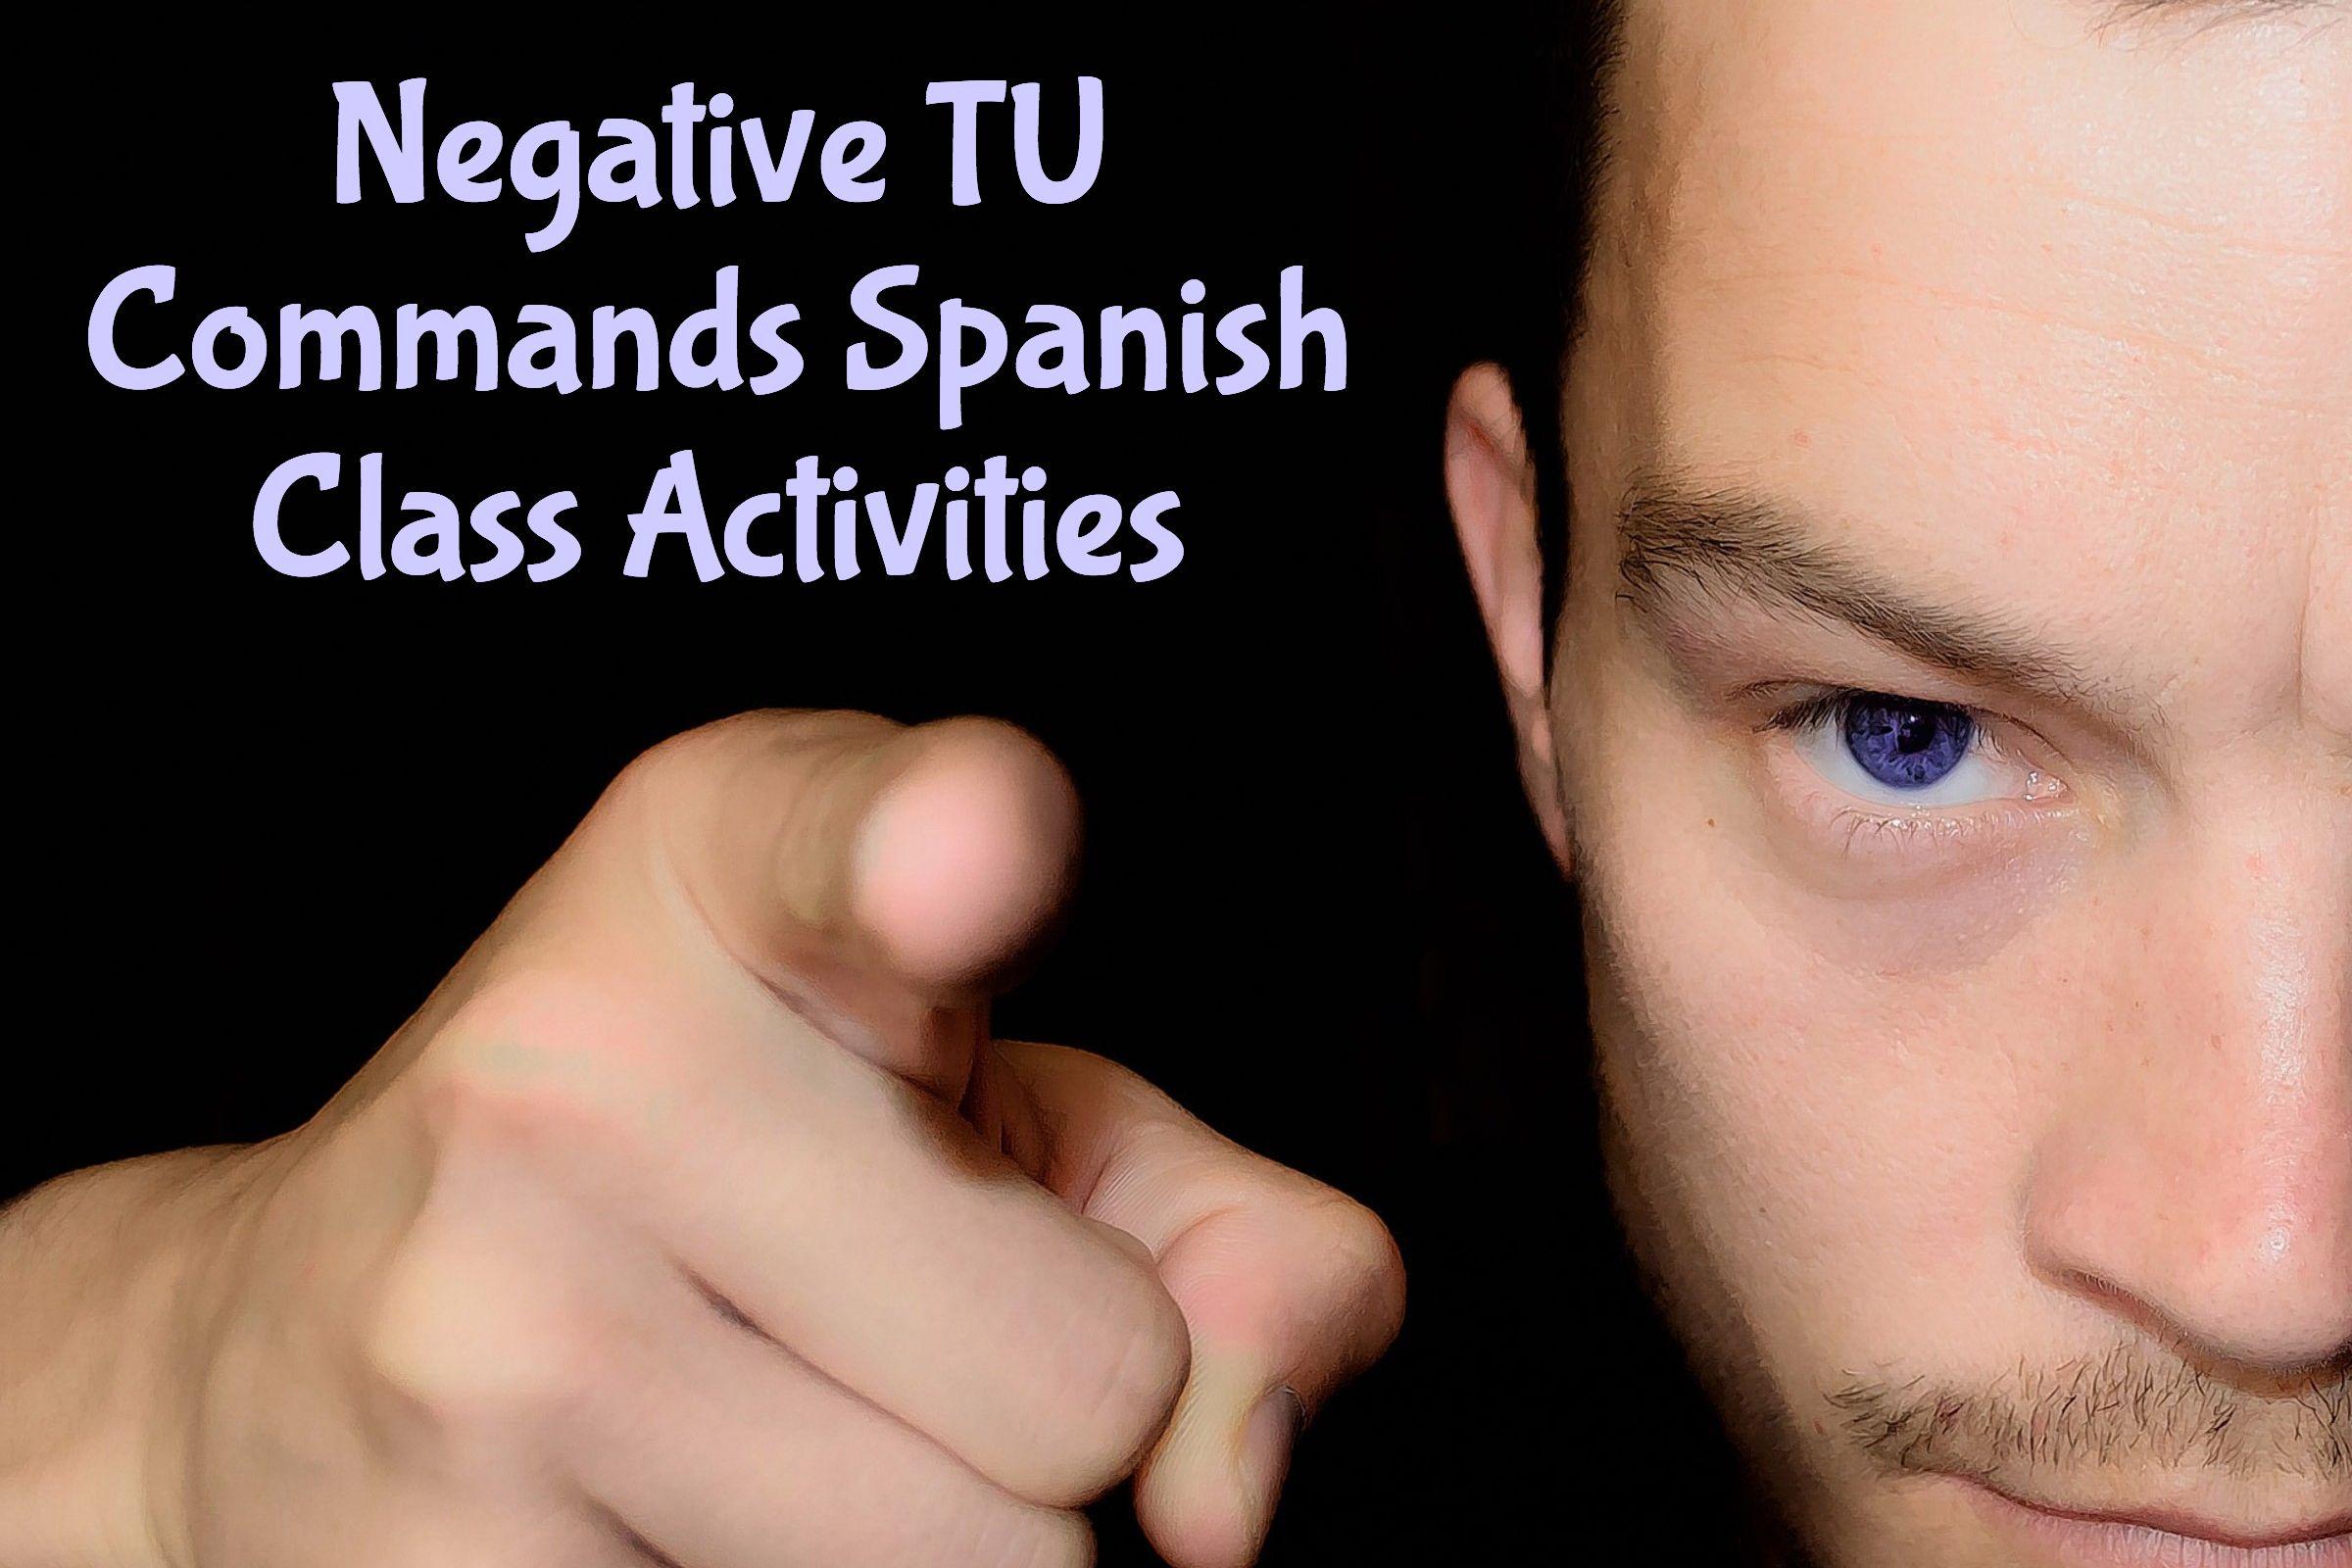 Negative Tu Commands Spanish Class Activities